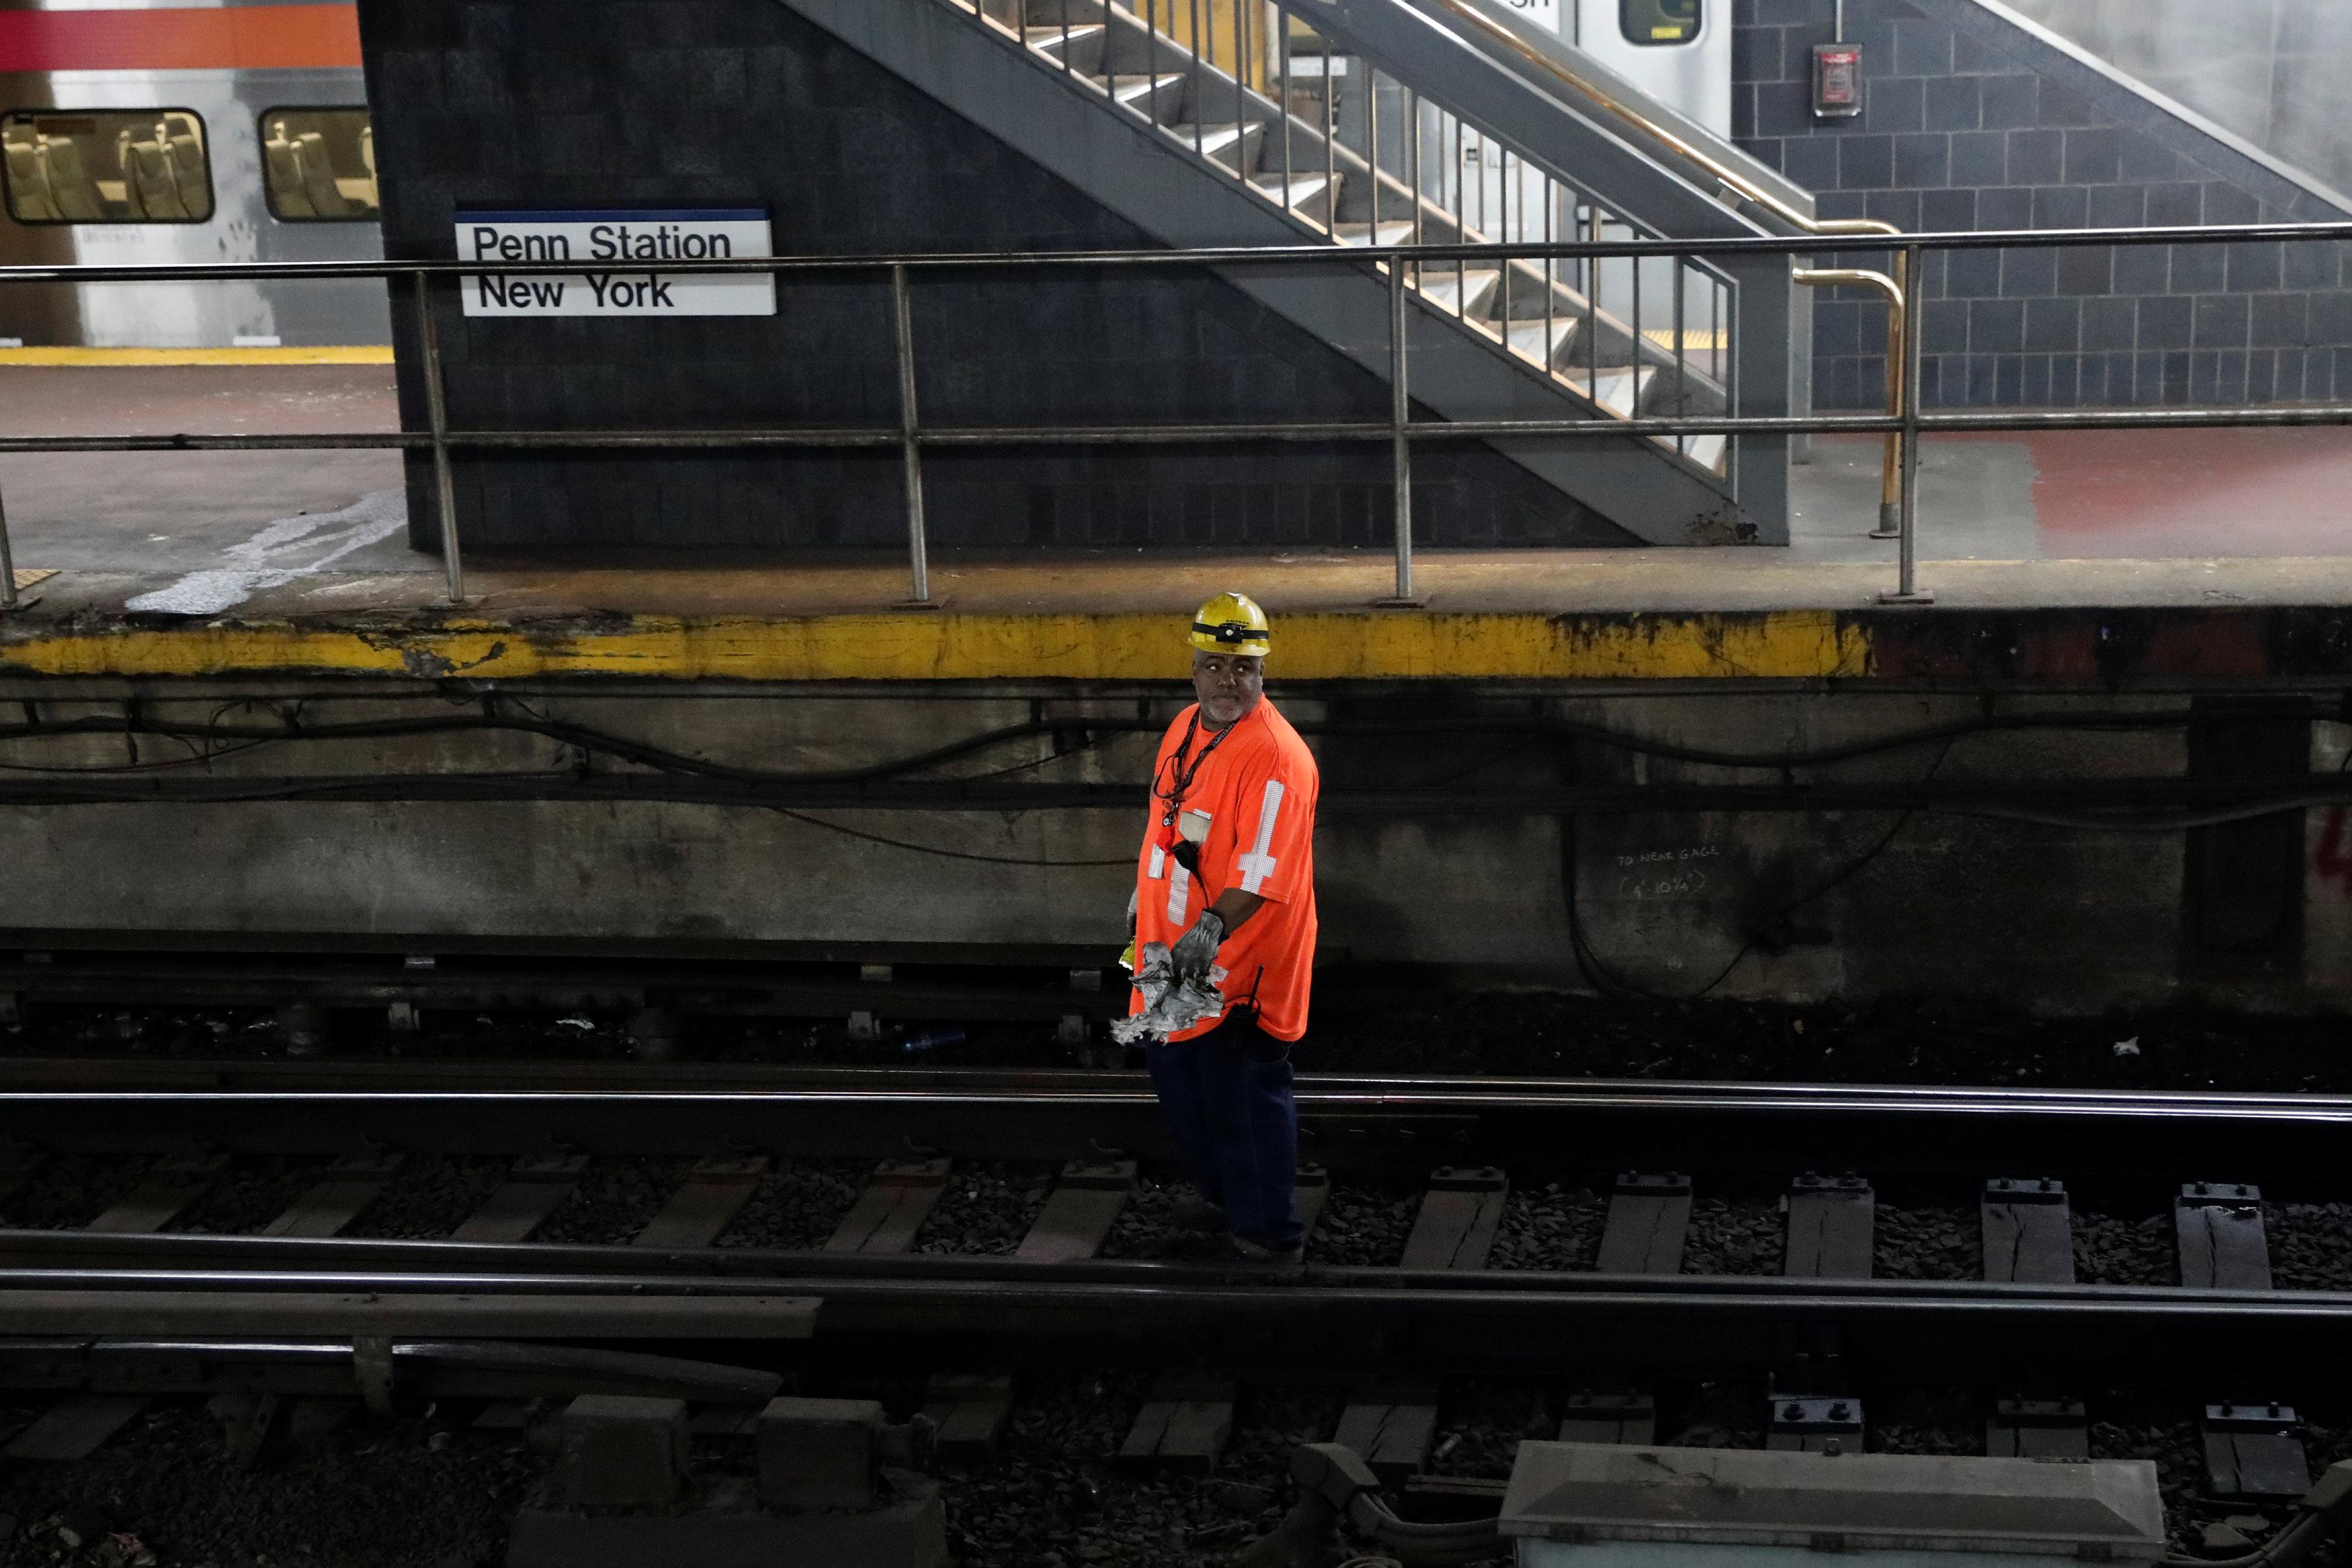 A worker walks on tracks inside New York City's Pennsylvania Station on April 27, 2017. (REUTERS/Mike Segar)